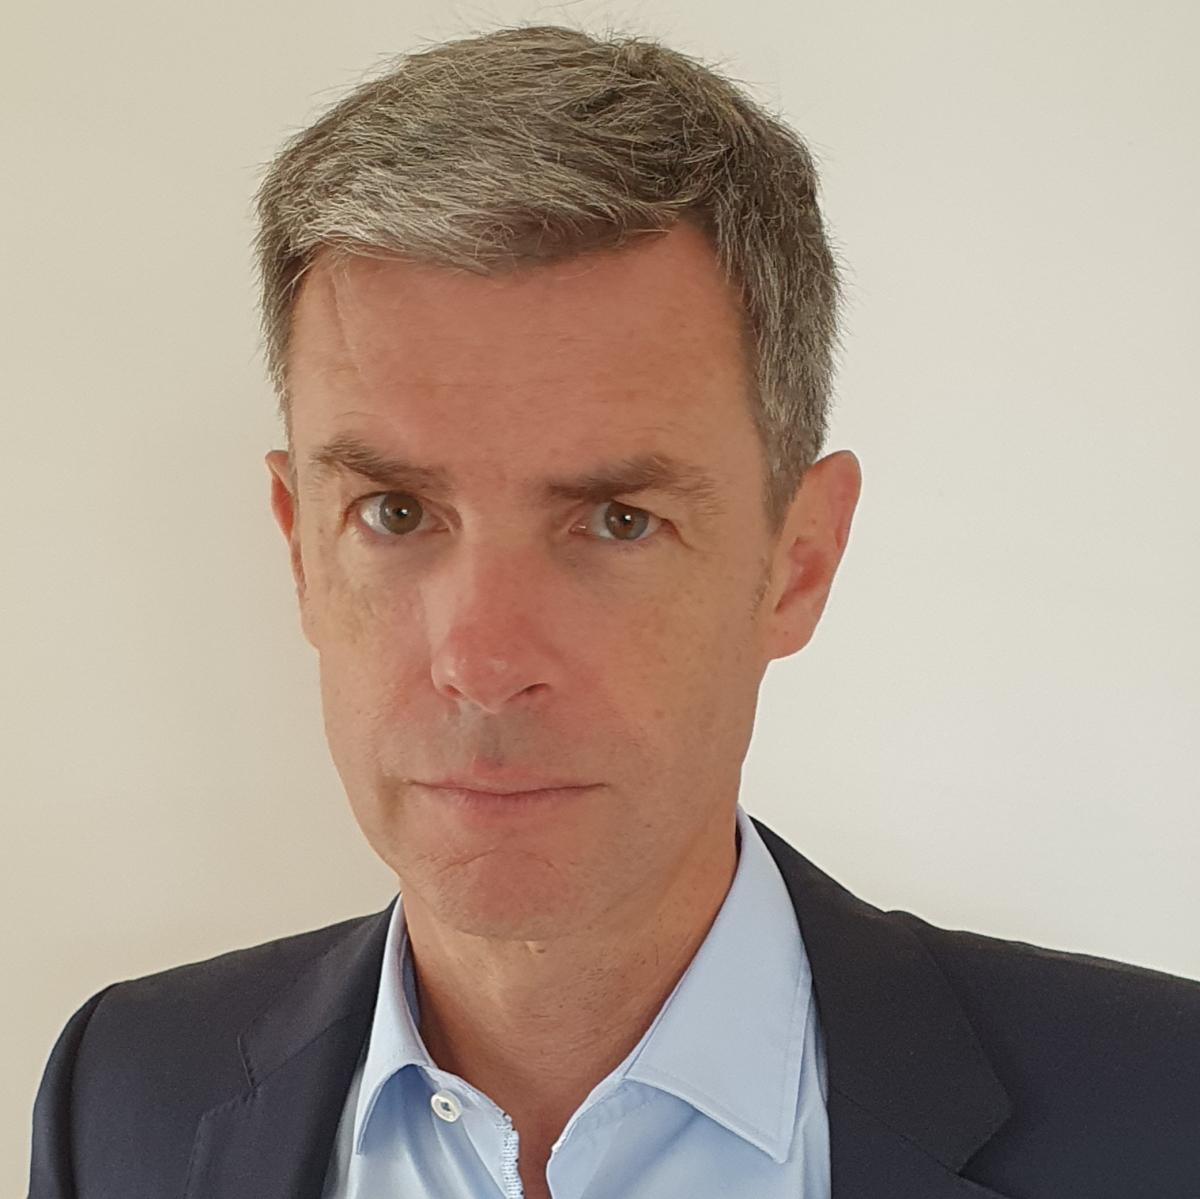 Jean-Christophe Legrand